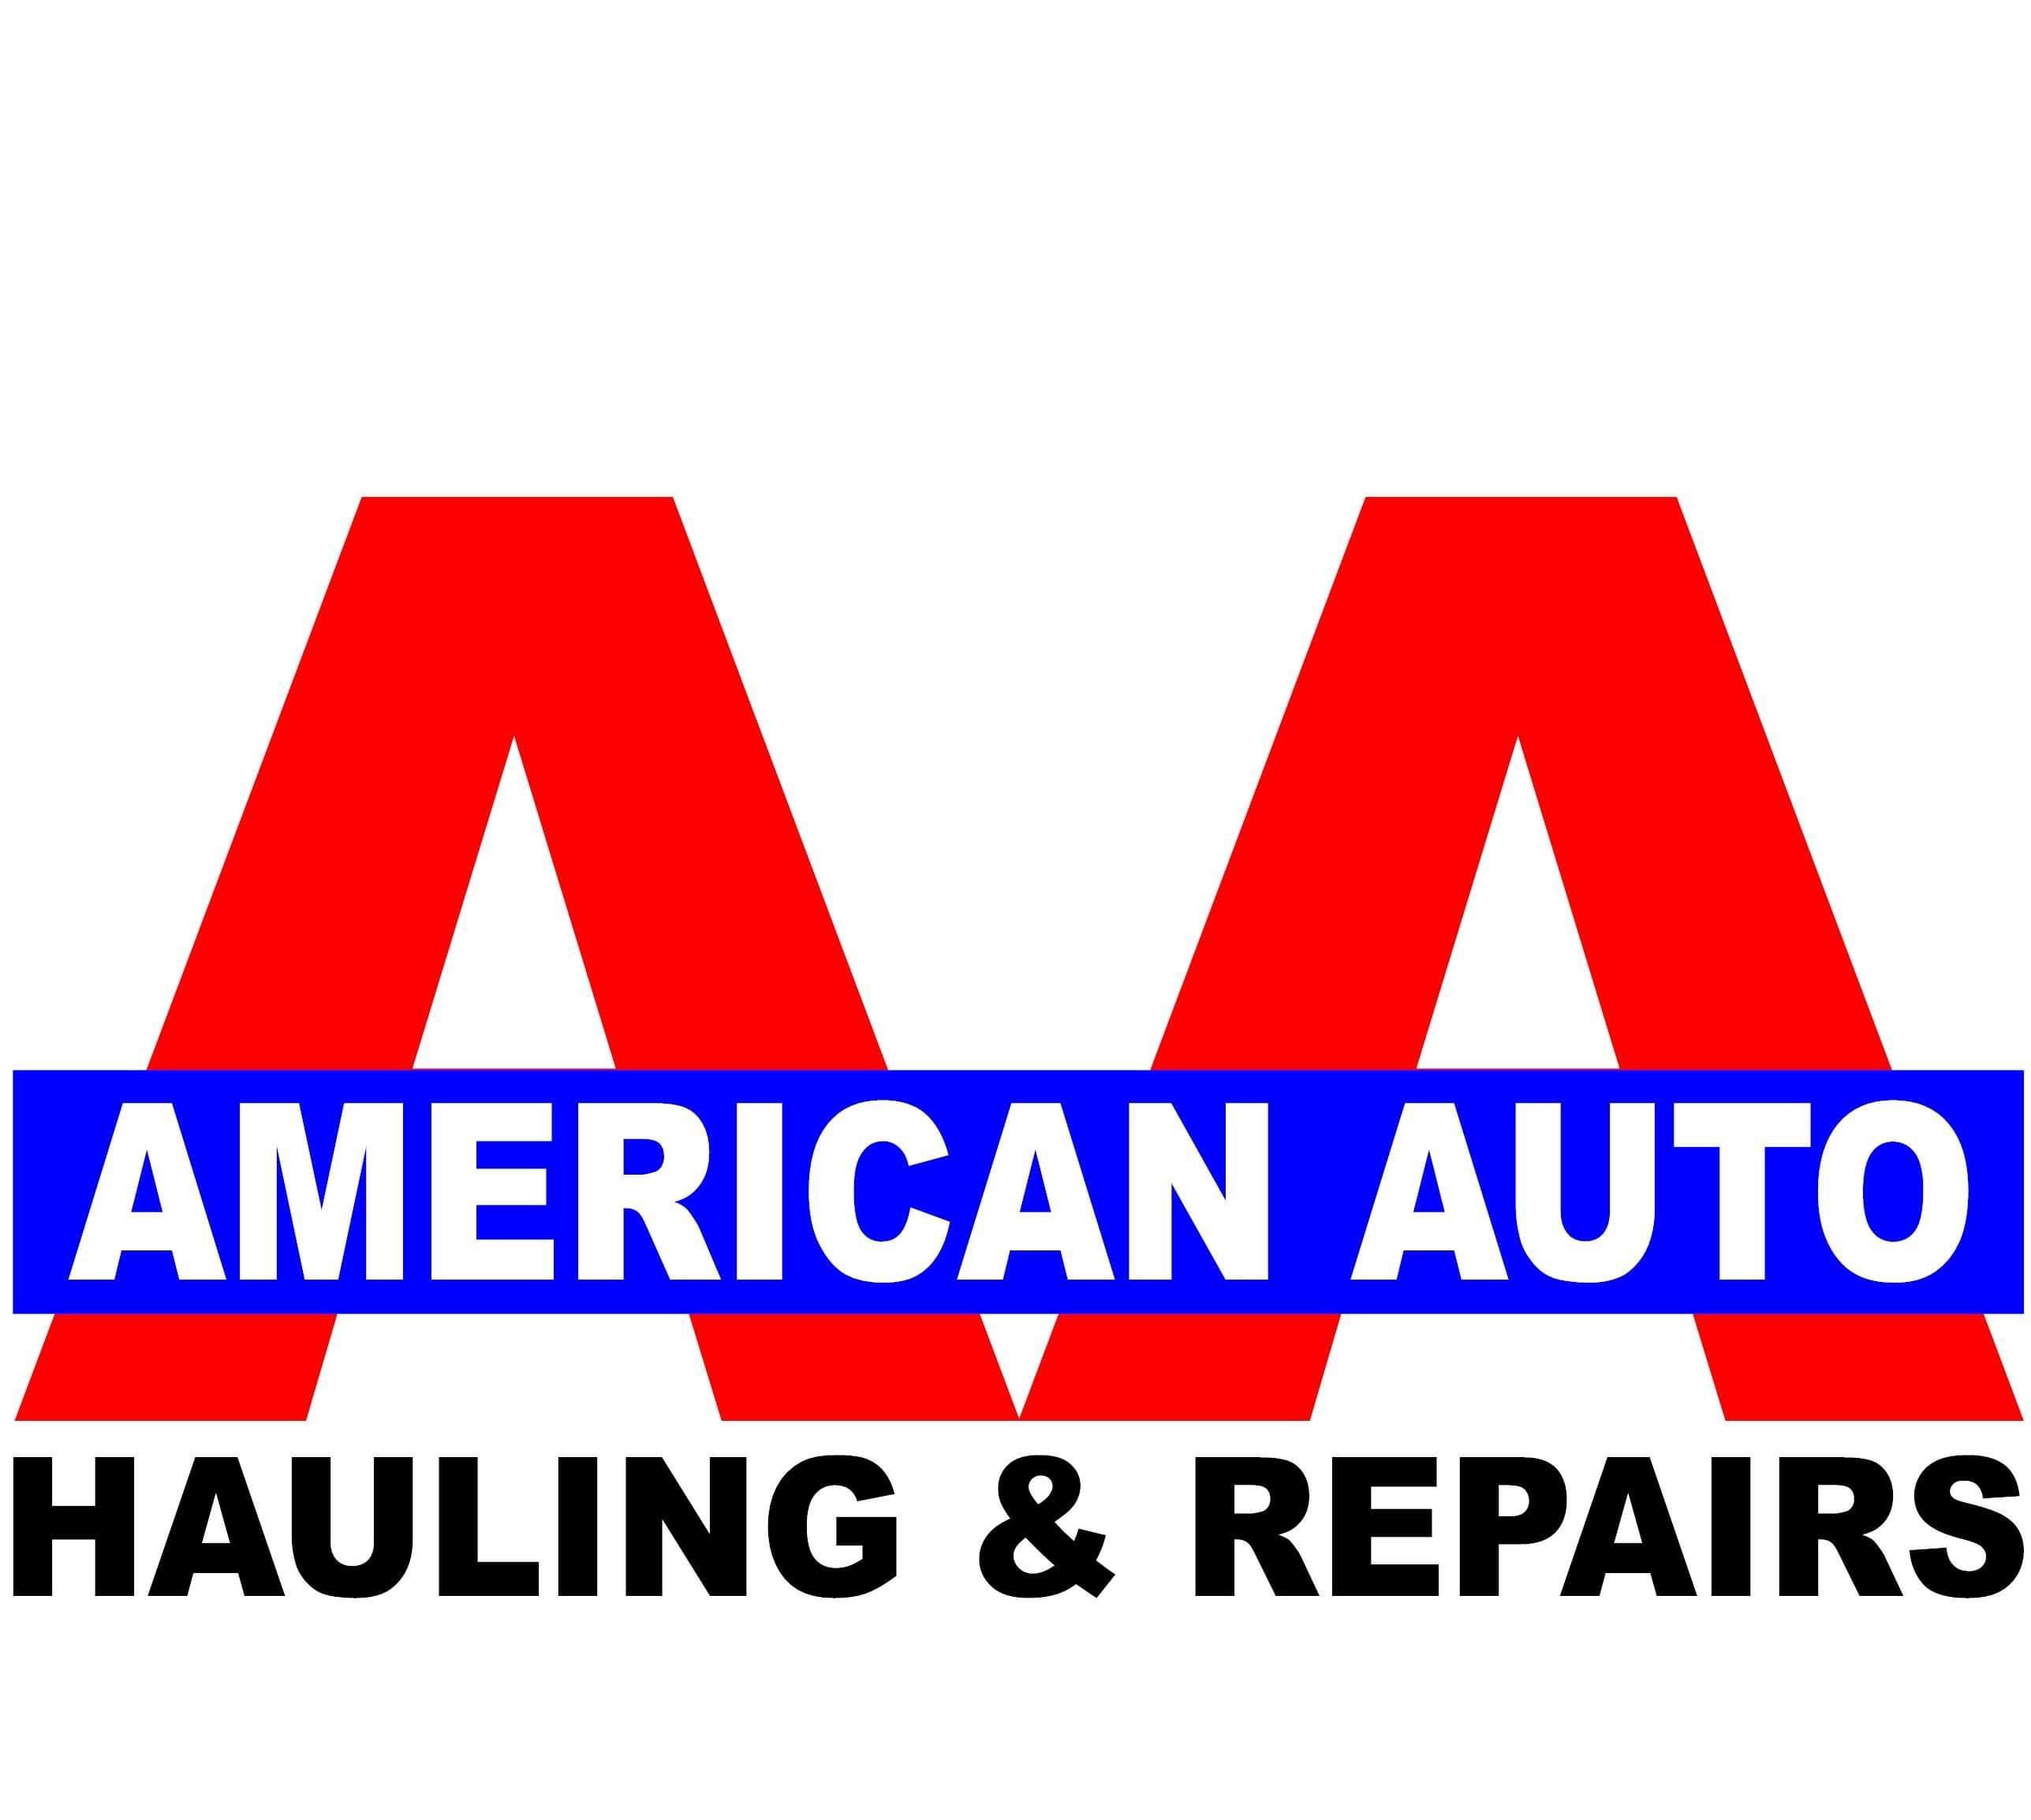 American Auto Hauling and Repair